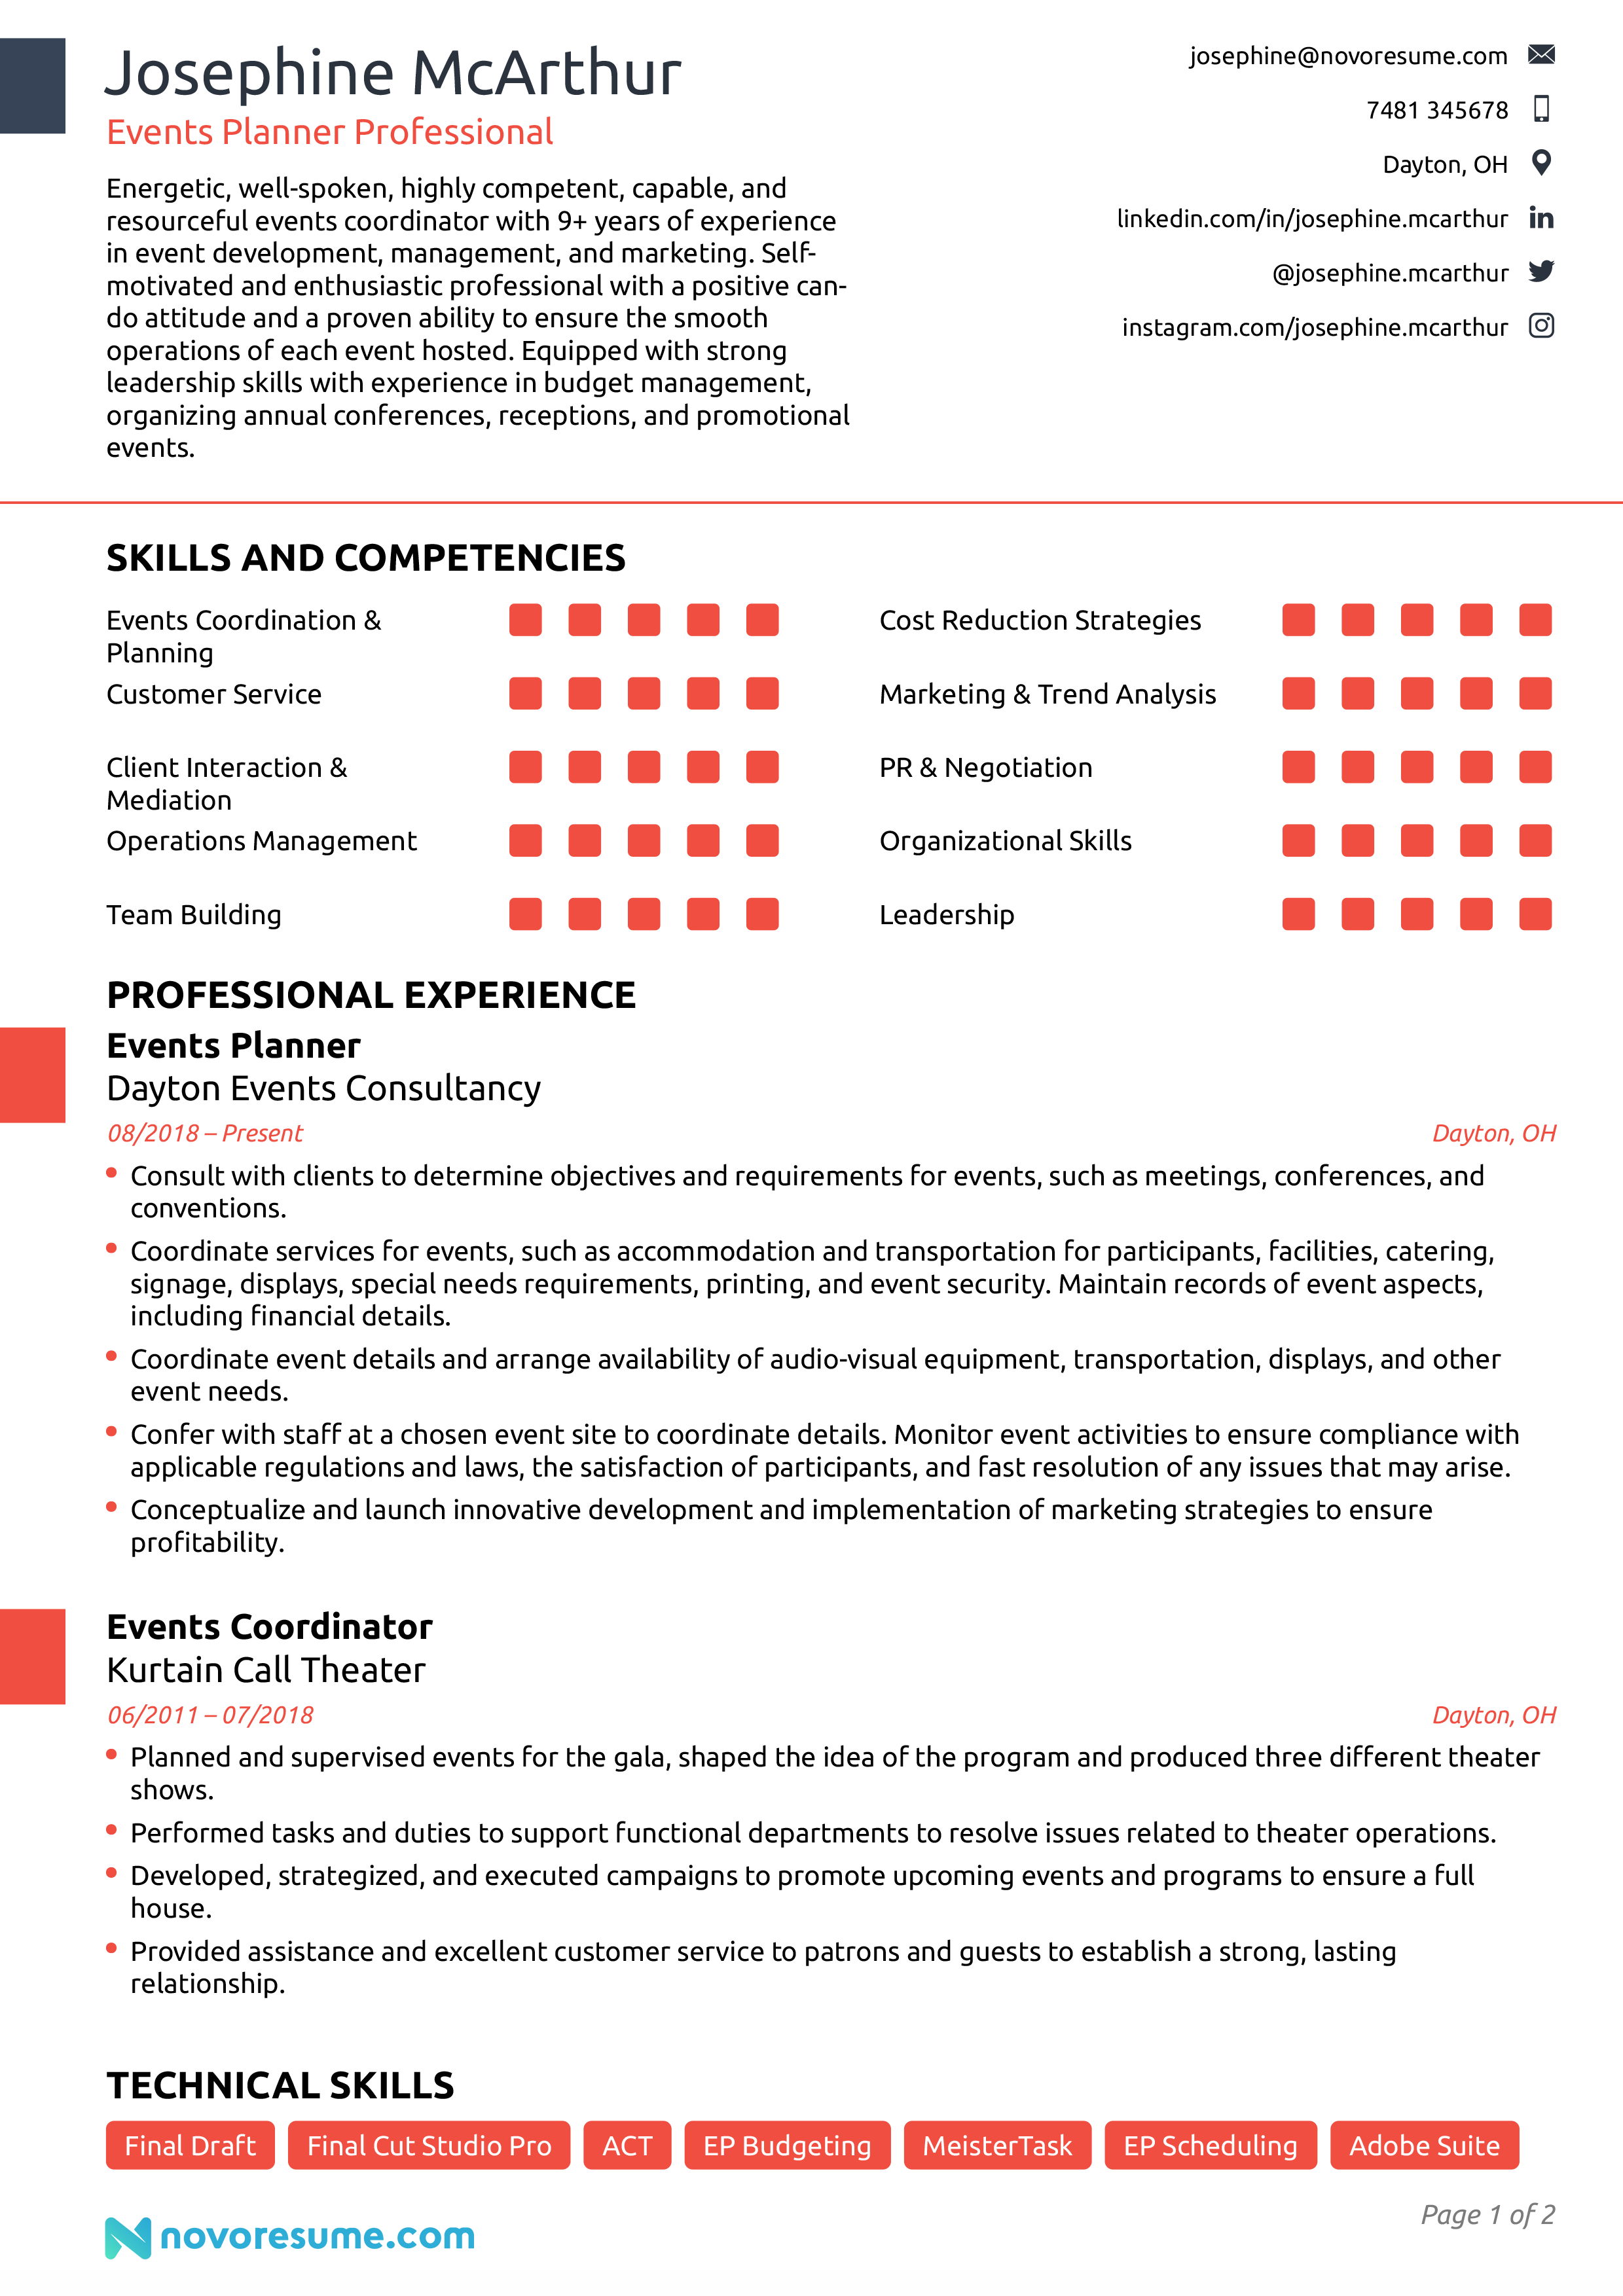 Resume for event coordinator objective vladimir nabokov perfect past essay